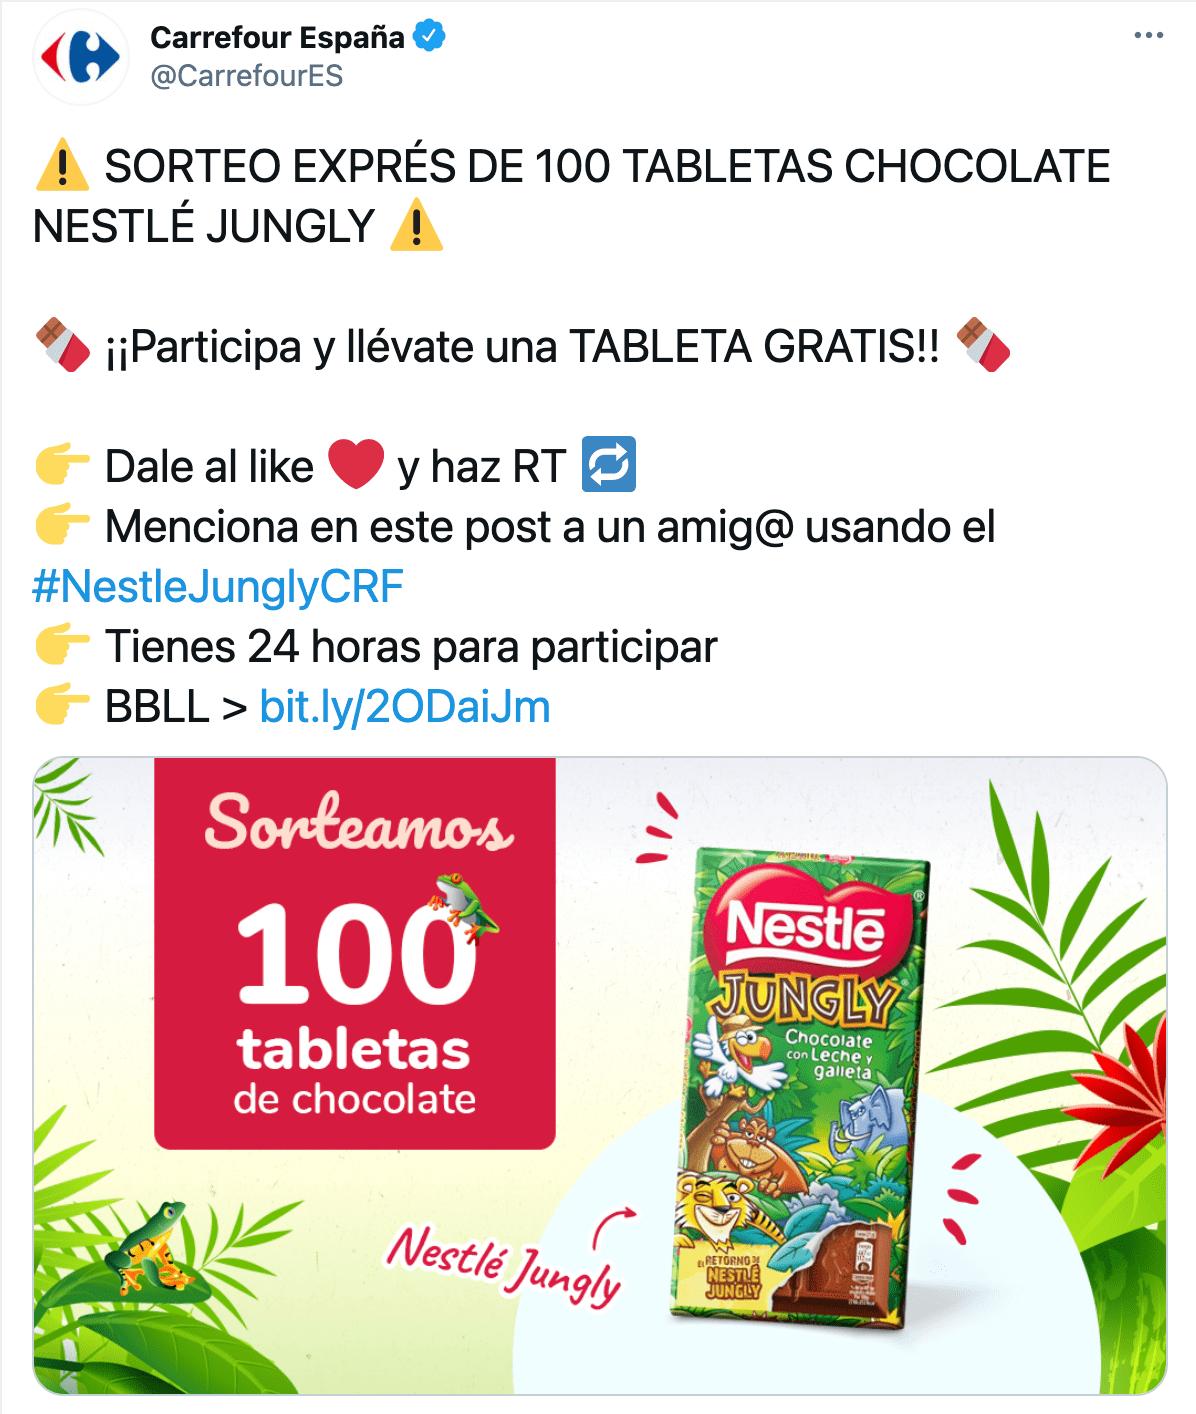 Nestlé Jungly Twitter Carrefour estrategia marketing